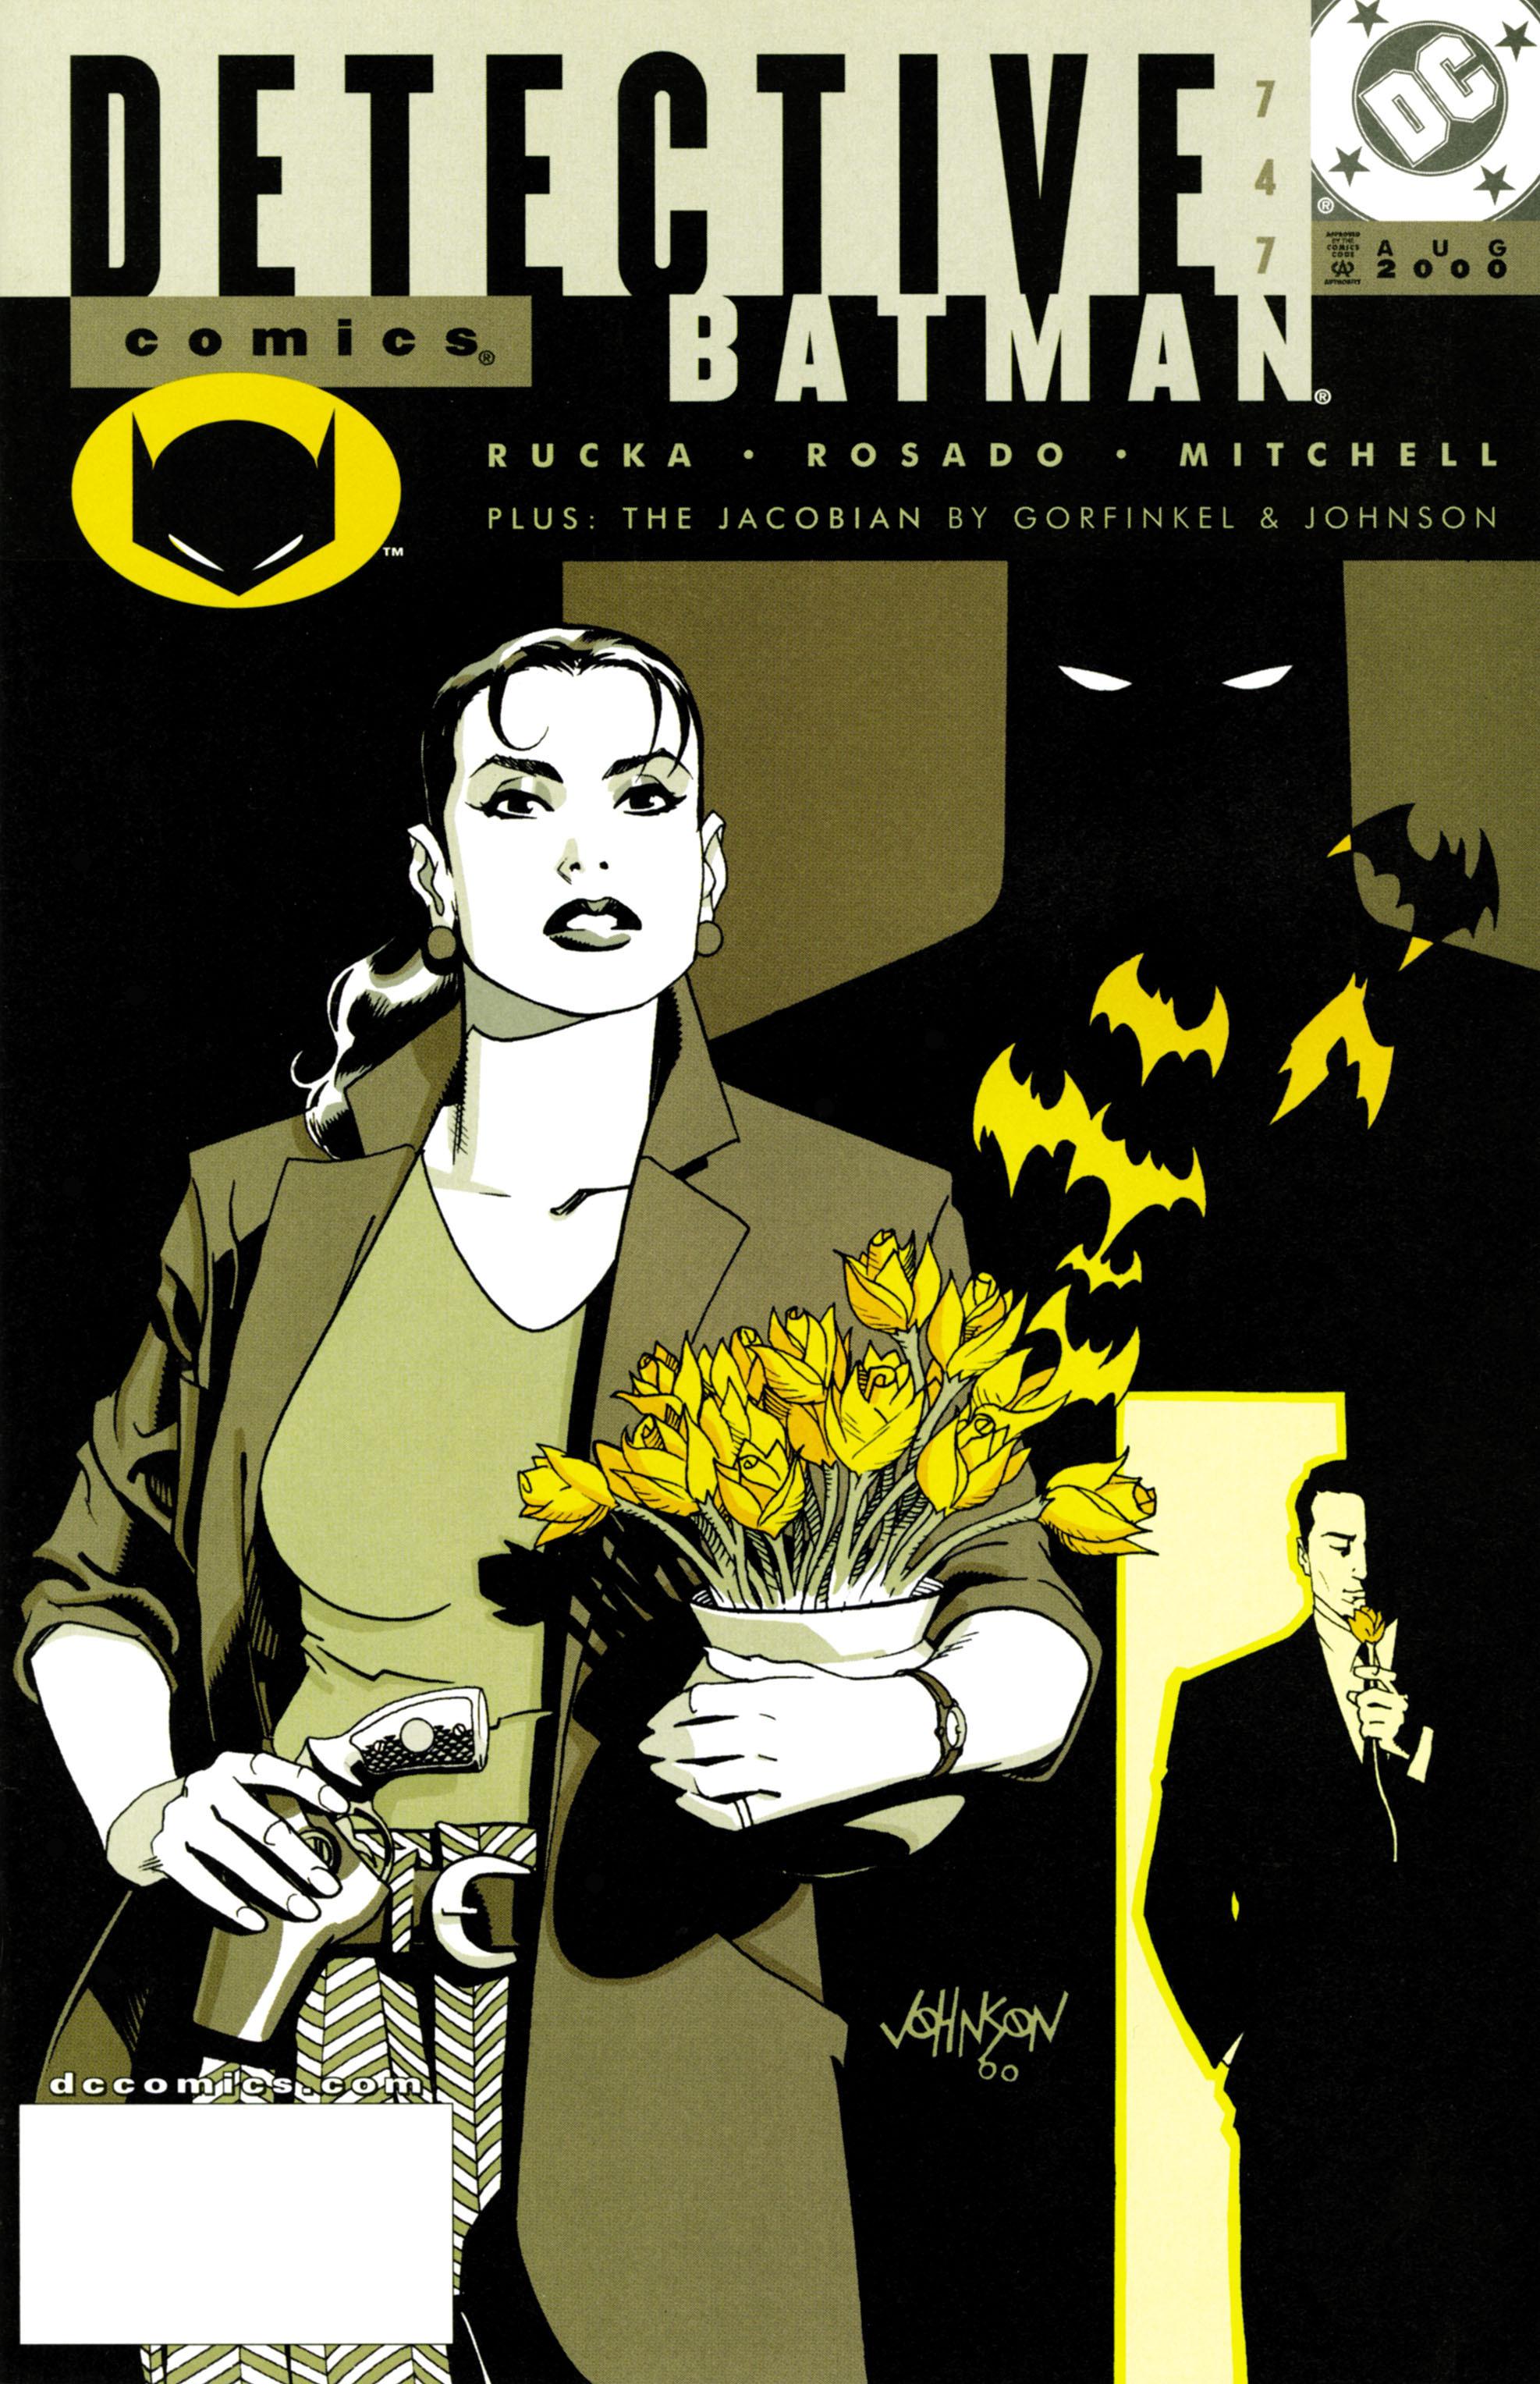 Detective Comics (1937) 747 Page 0